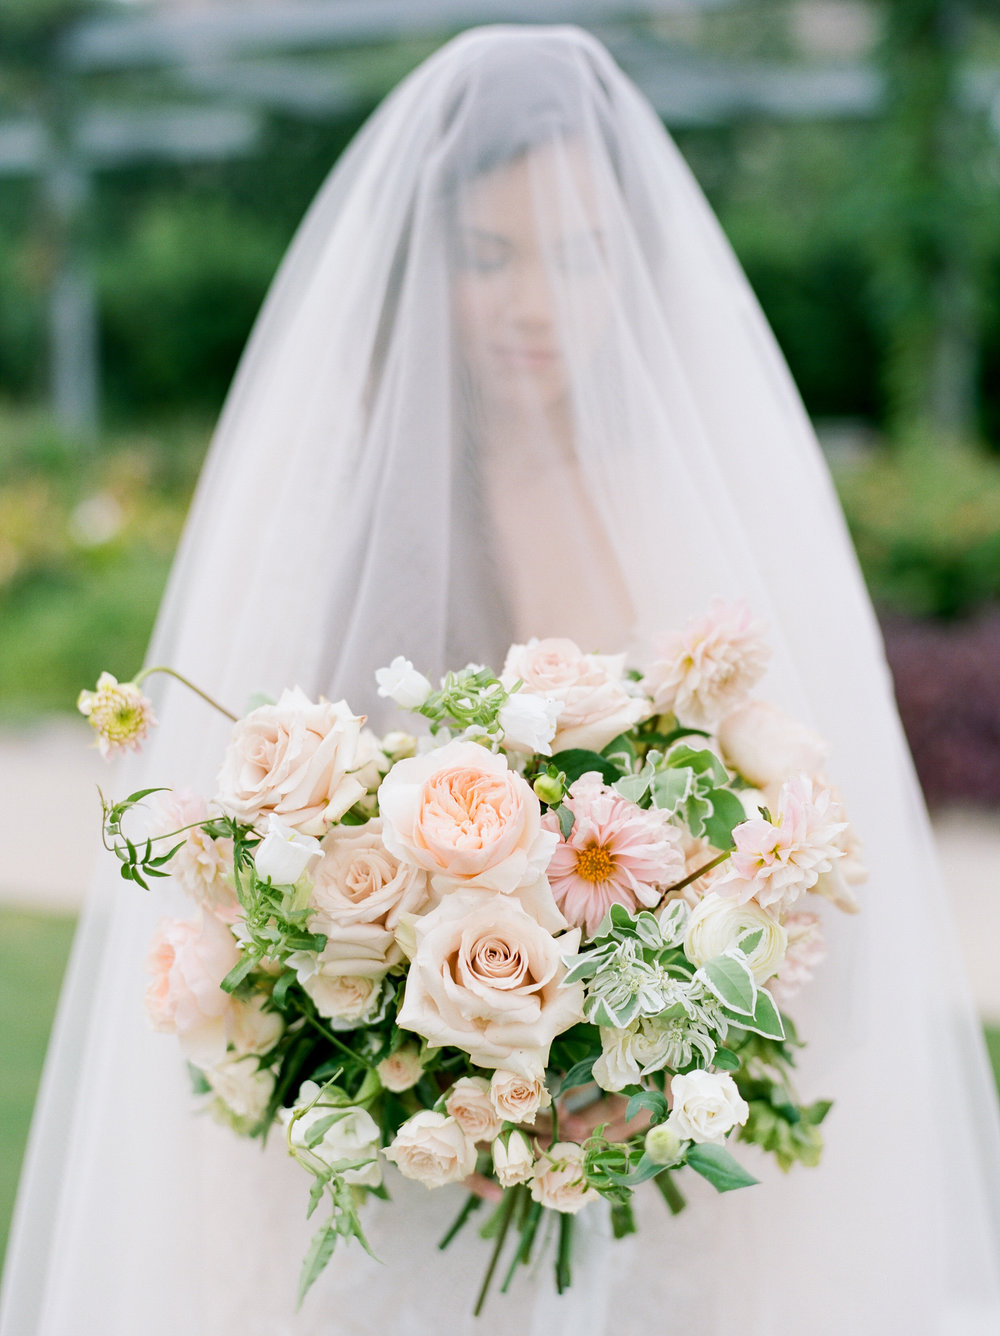 Fine-Art-Film-Houston-Wedding-Photographer-Best-Top-Luxury-Texas-Austin-Dallas-Destination-Dana-Fernandez-Photography-Portrait-Bridals-McGovern-Centennial-Gardens-2.jpg